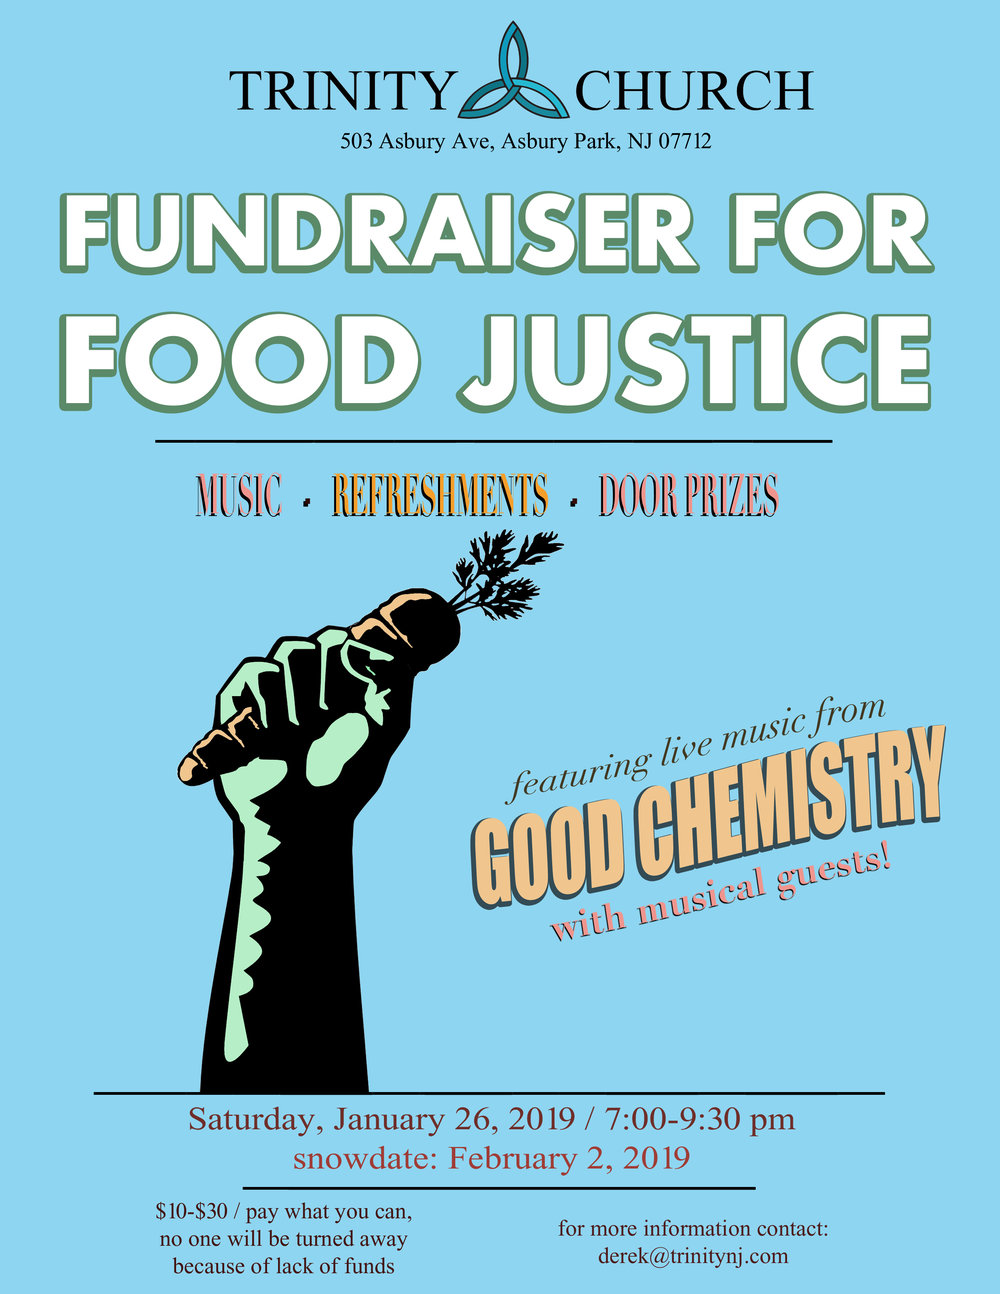 food justice_8.5x11 (1).jpg